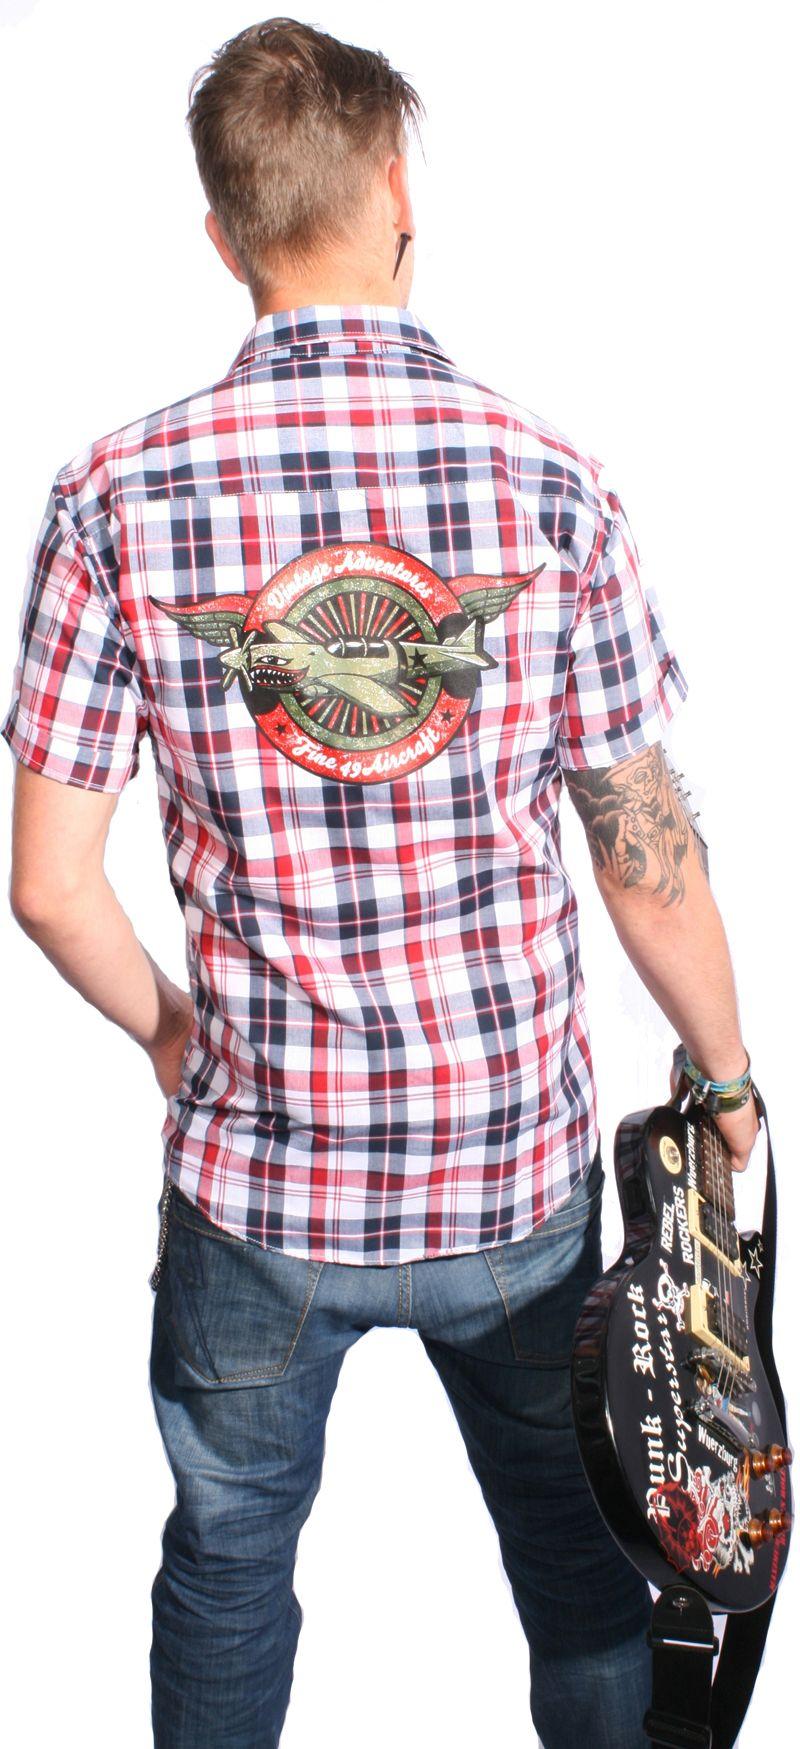 Like this shirt as well tattoo shirts shirts mens tops